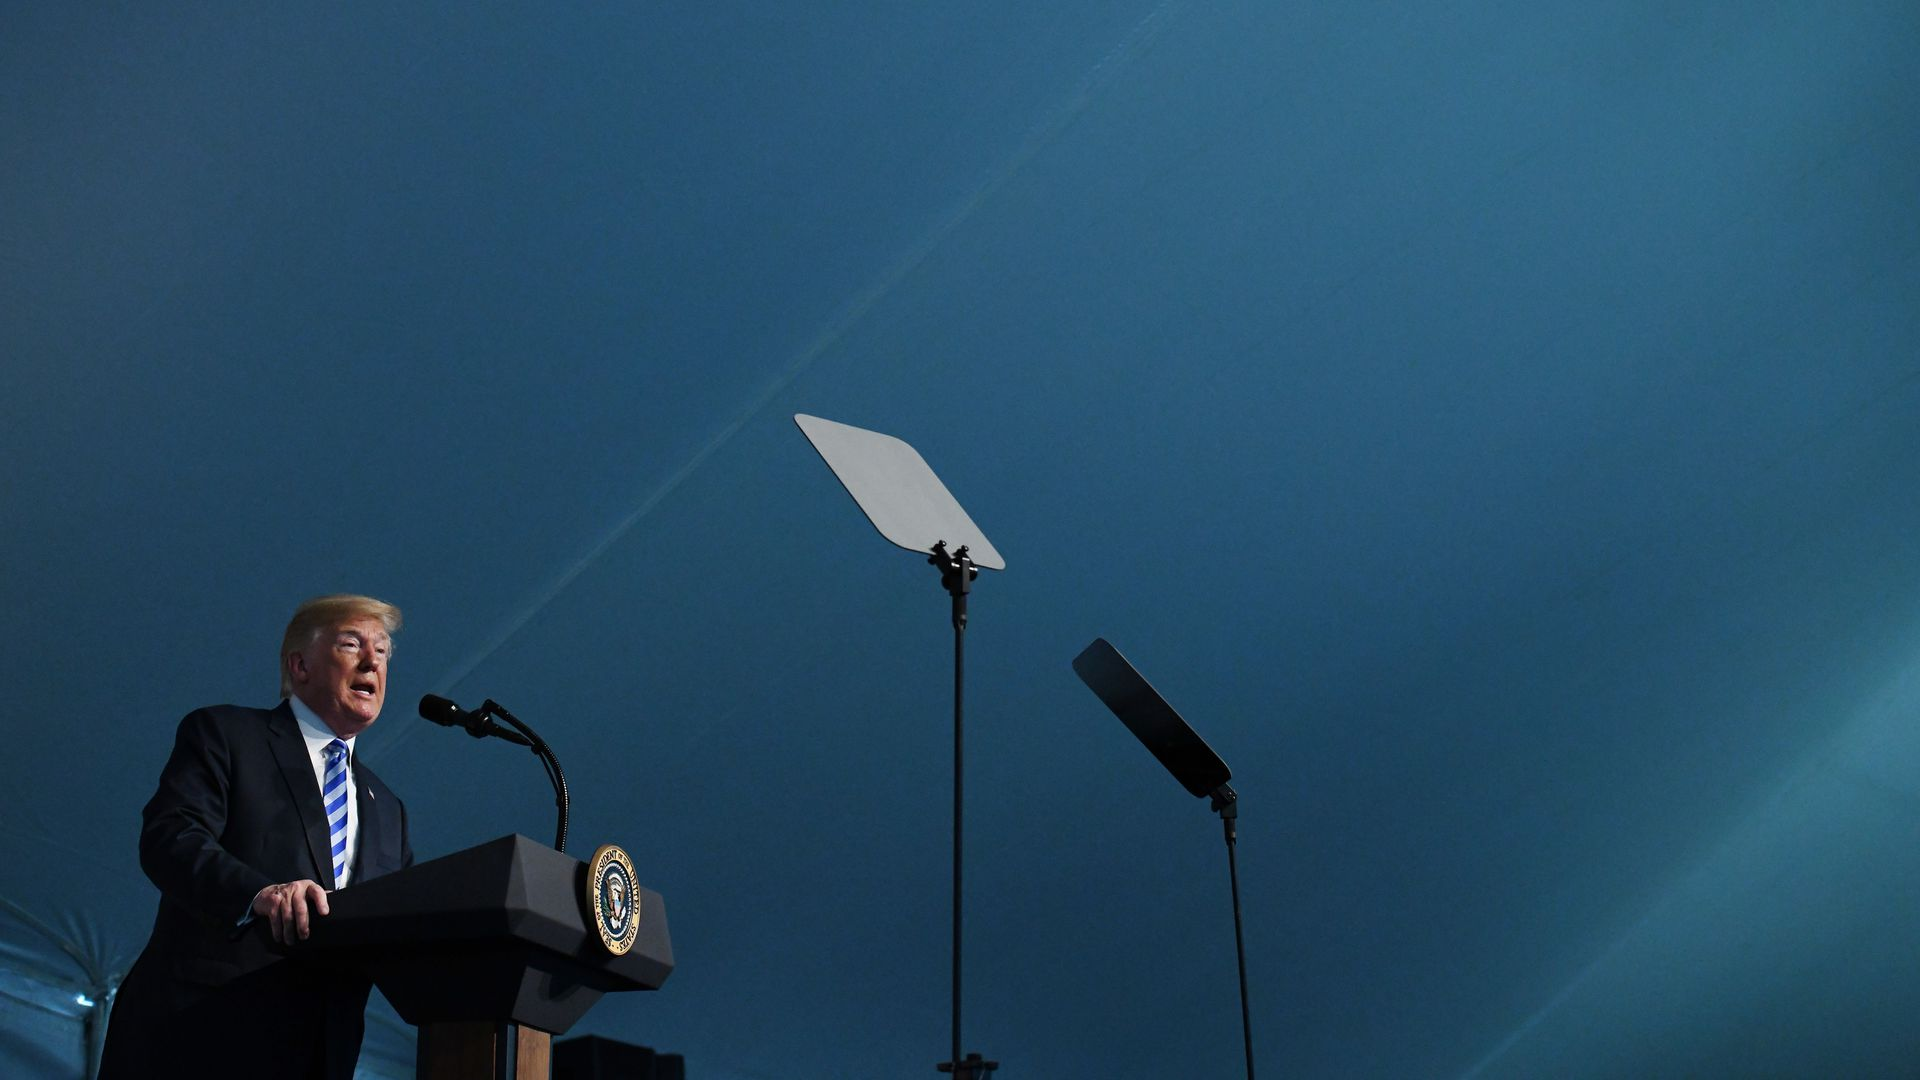 President Trump speaking at a podium.